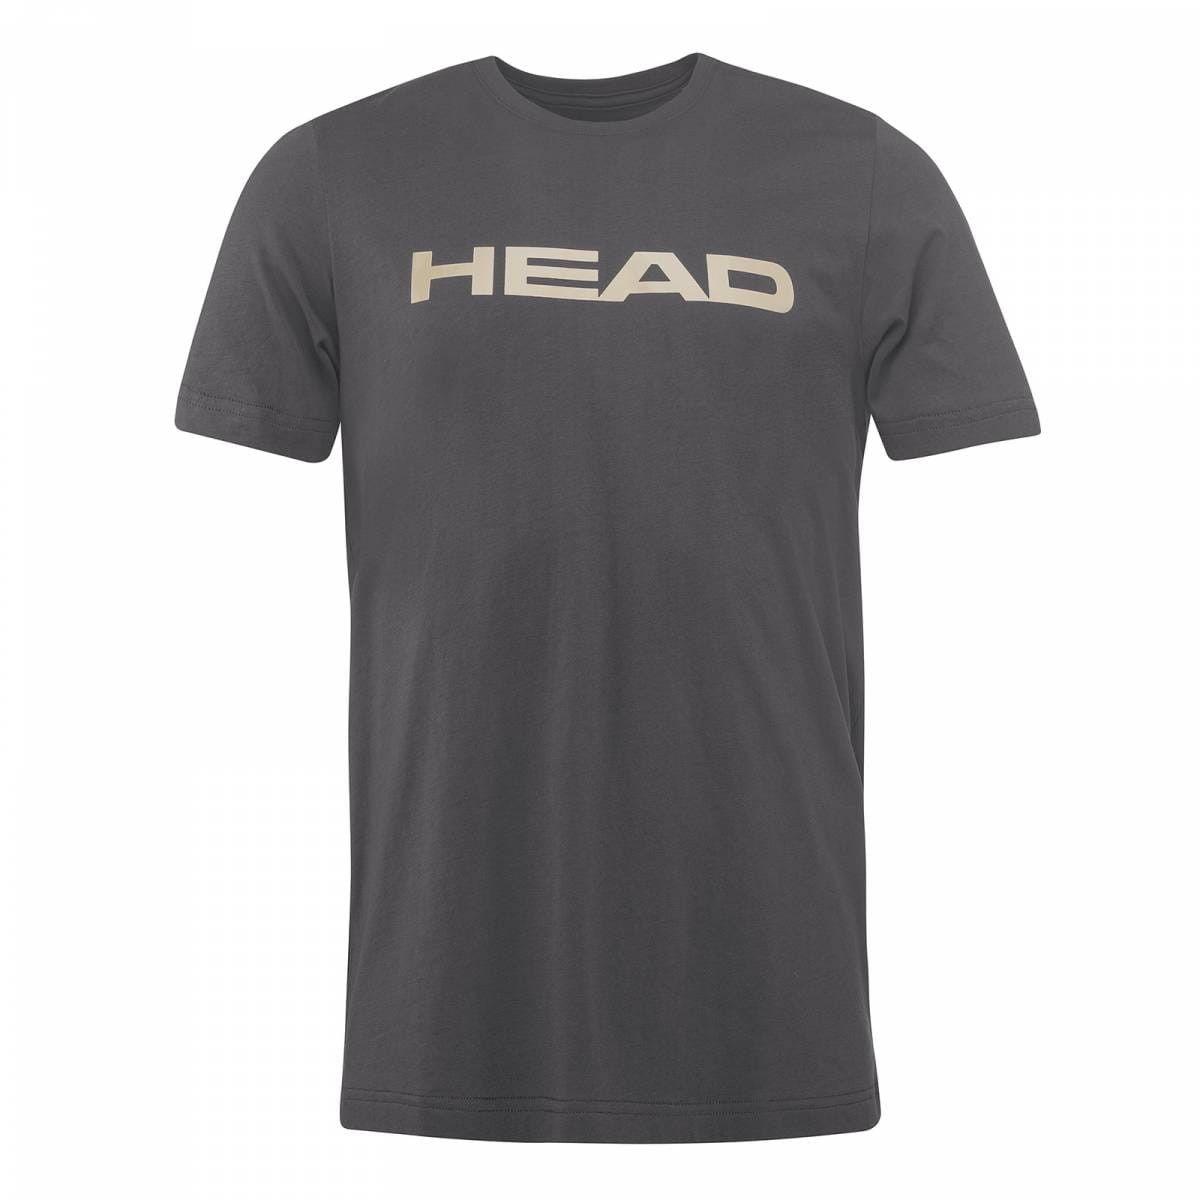 Head Ivan T-Shirt Jr - anthracite/dust